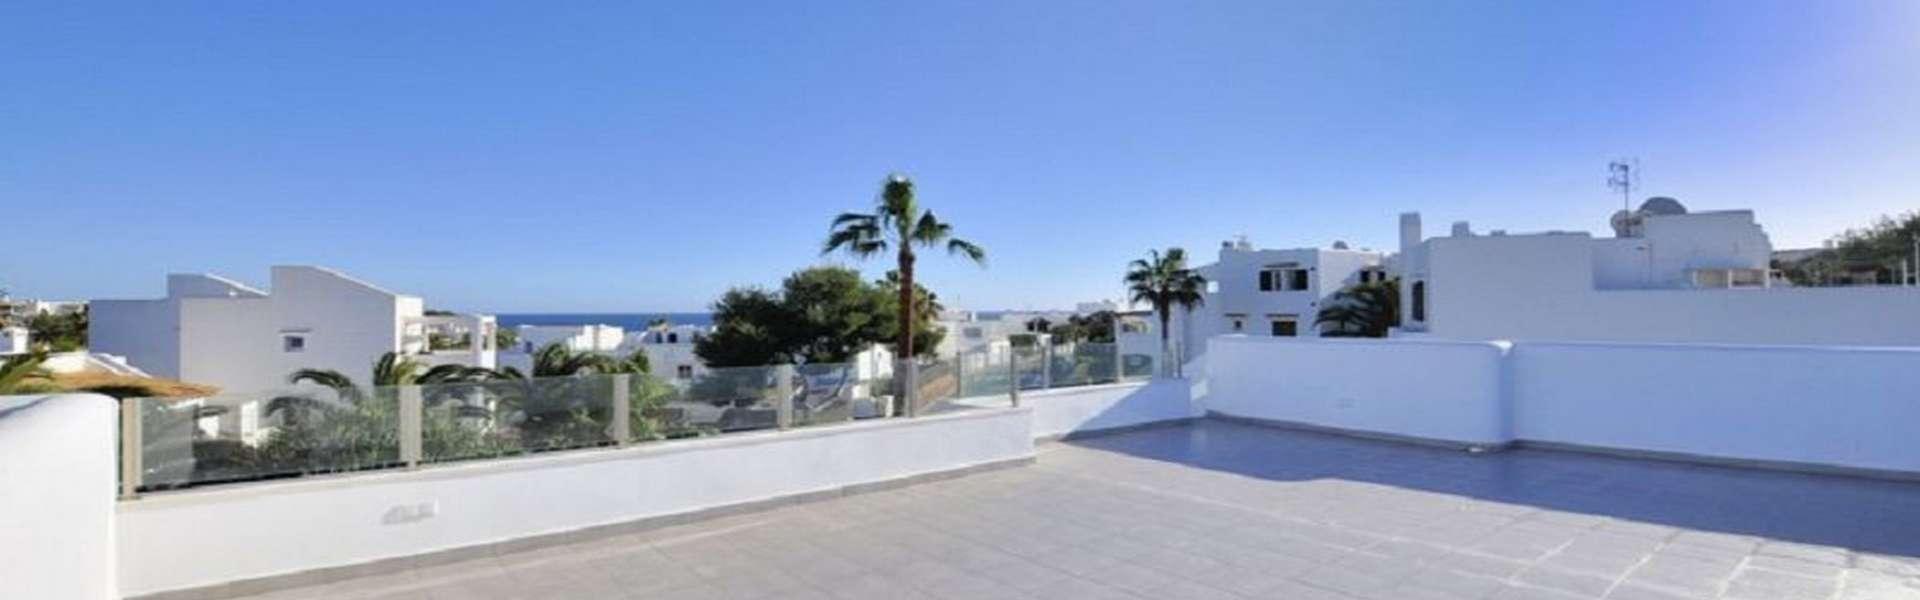 Se vende chalet moderno con vistas al mar en Cala d'Or